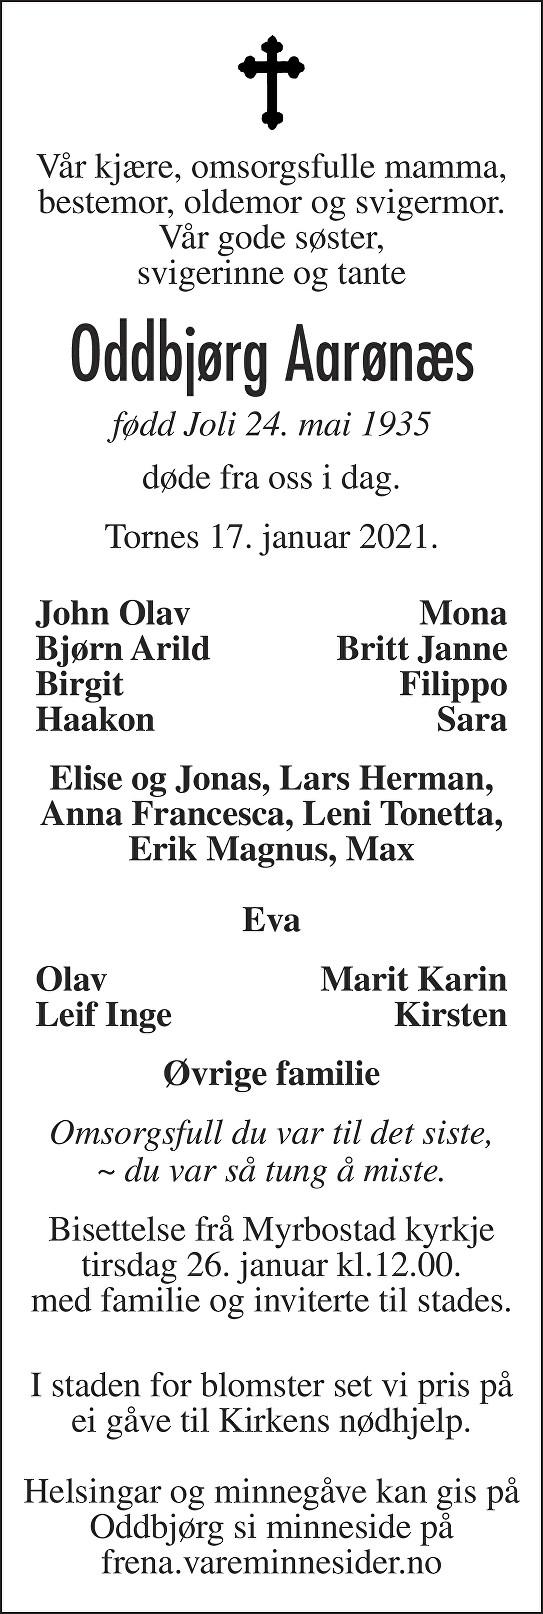 Oddbjørg Aarønæs Dødsannonse